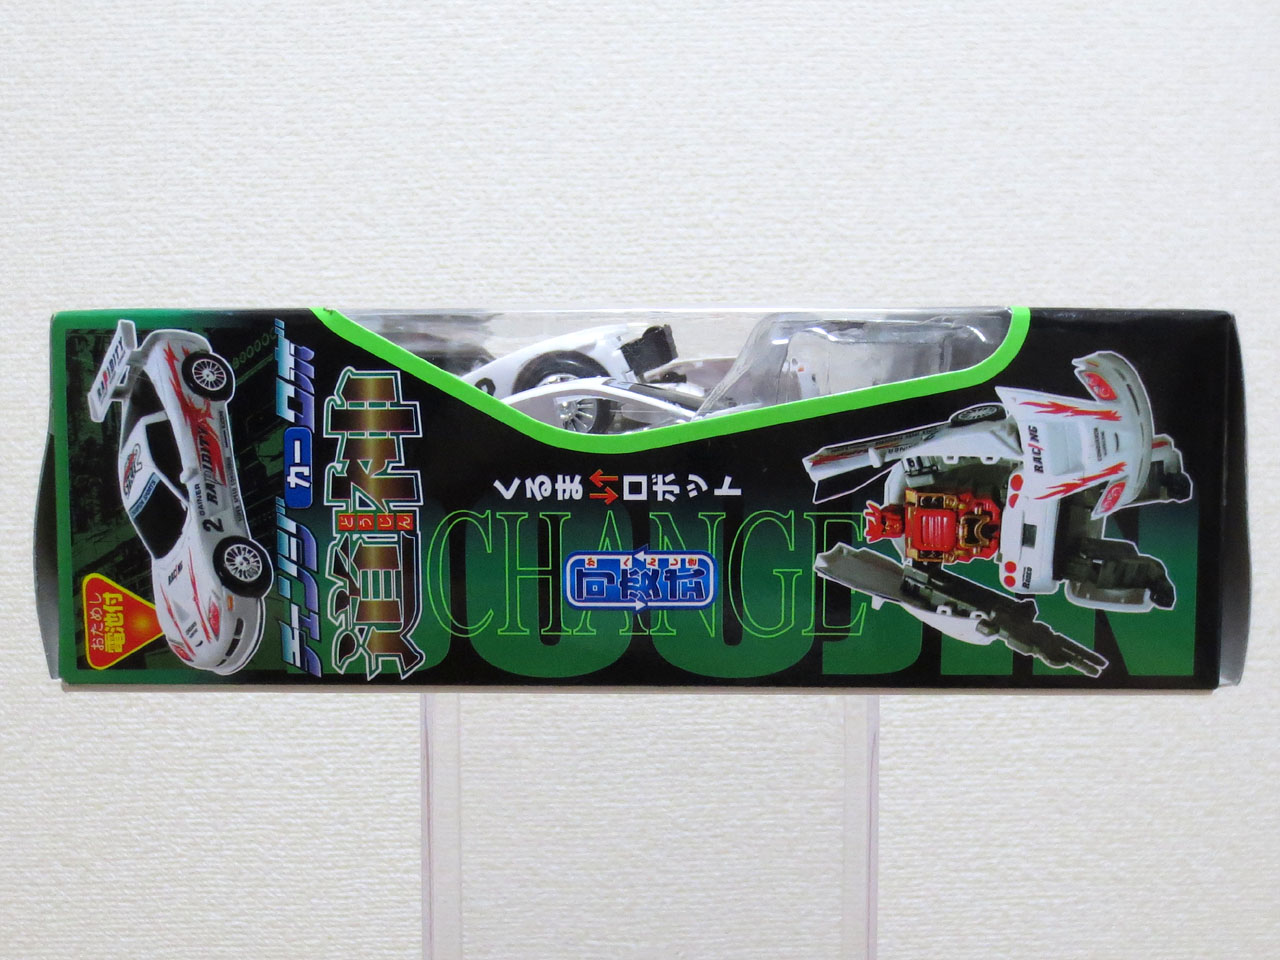 Change_Car_Robot_Doujin_03.jpg